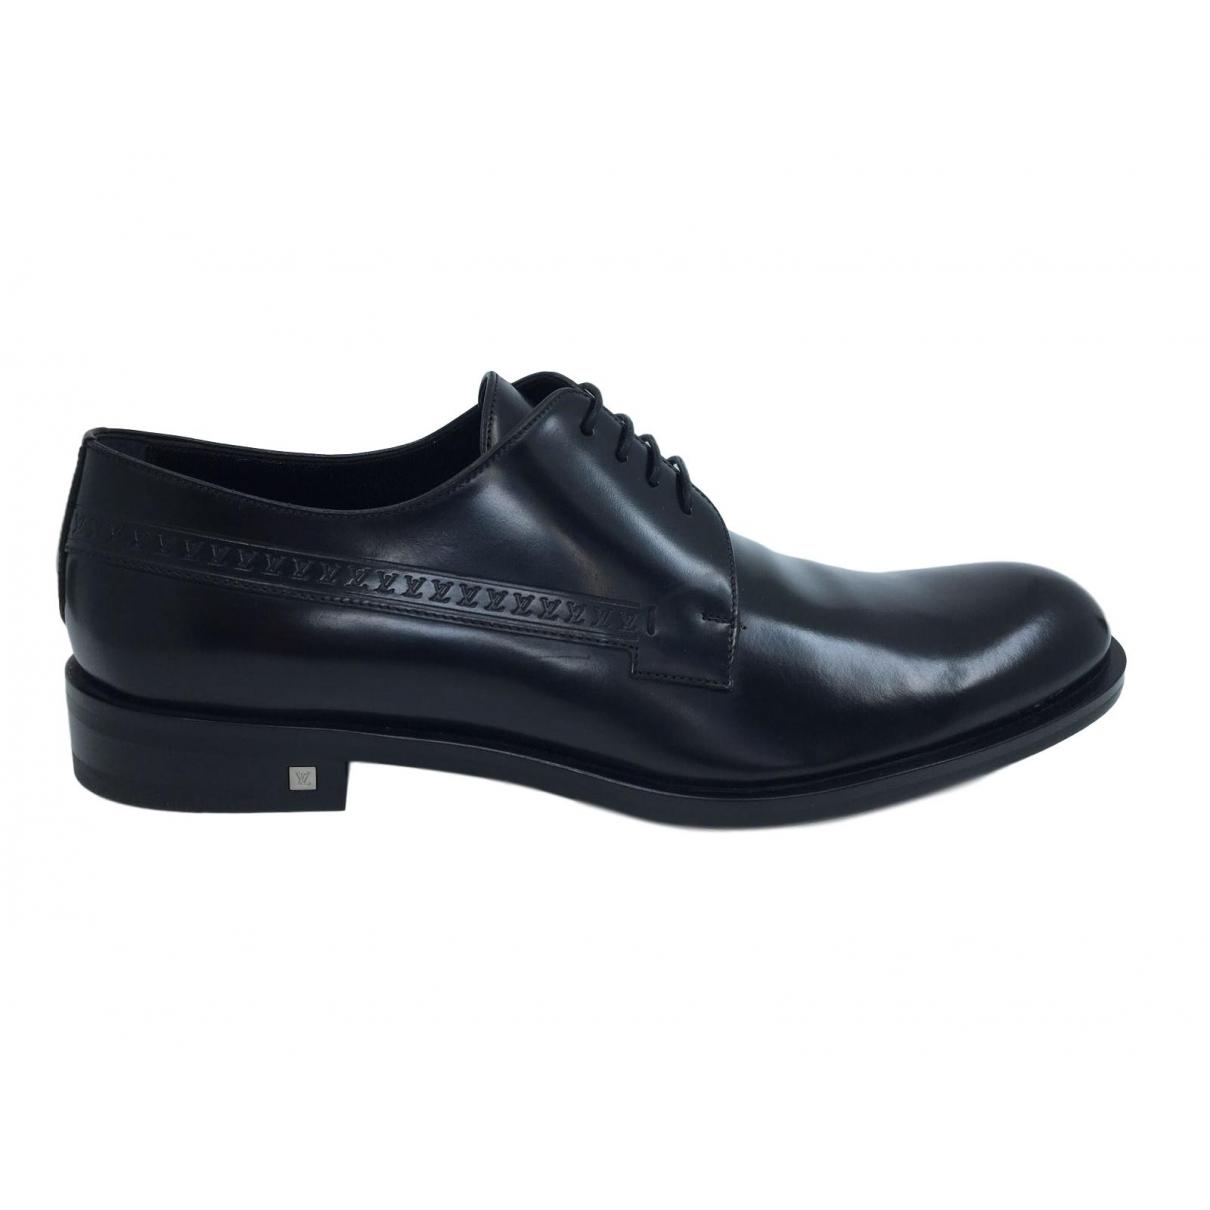 Louis Vuitton \N Black Leather Lace ups for Men 8.5 UK